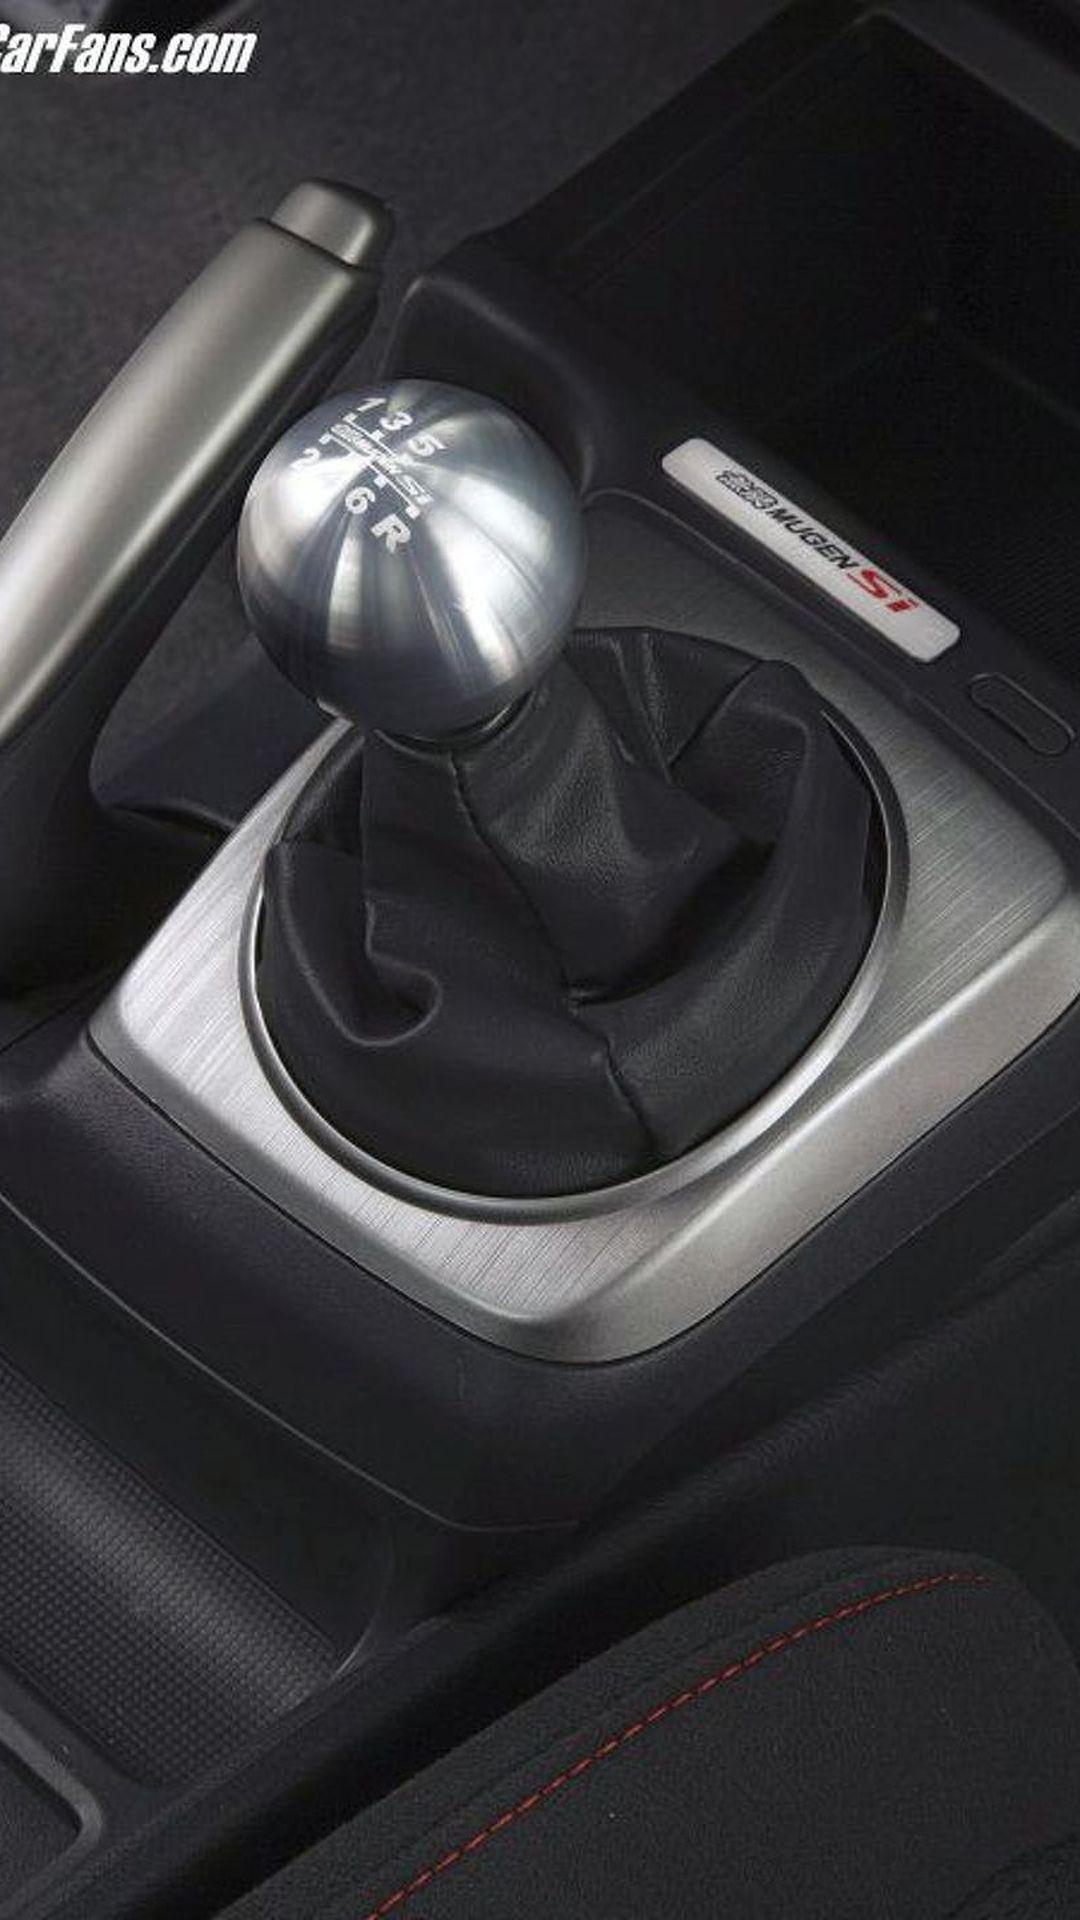 2006 Honda Civic Si Interior : honda, civic, interior, Honda, Civic, MUGEN, Sedan, 119760